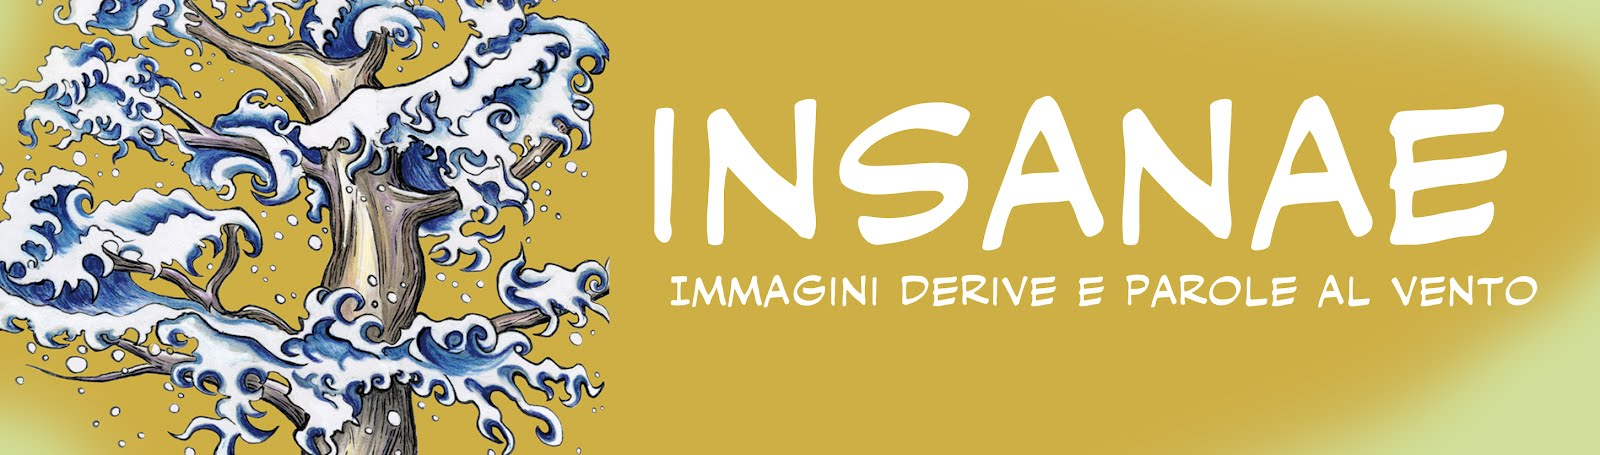 Insanae